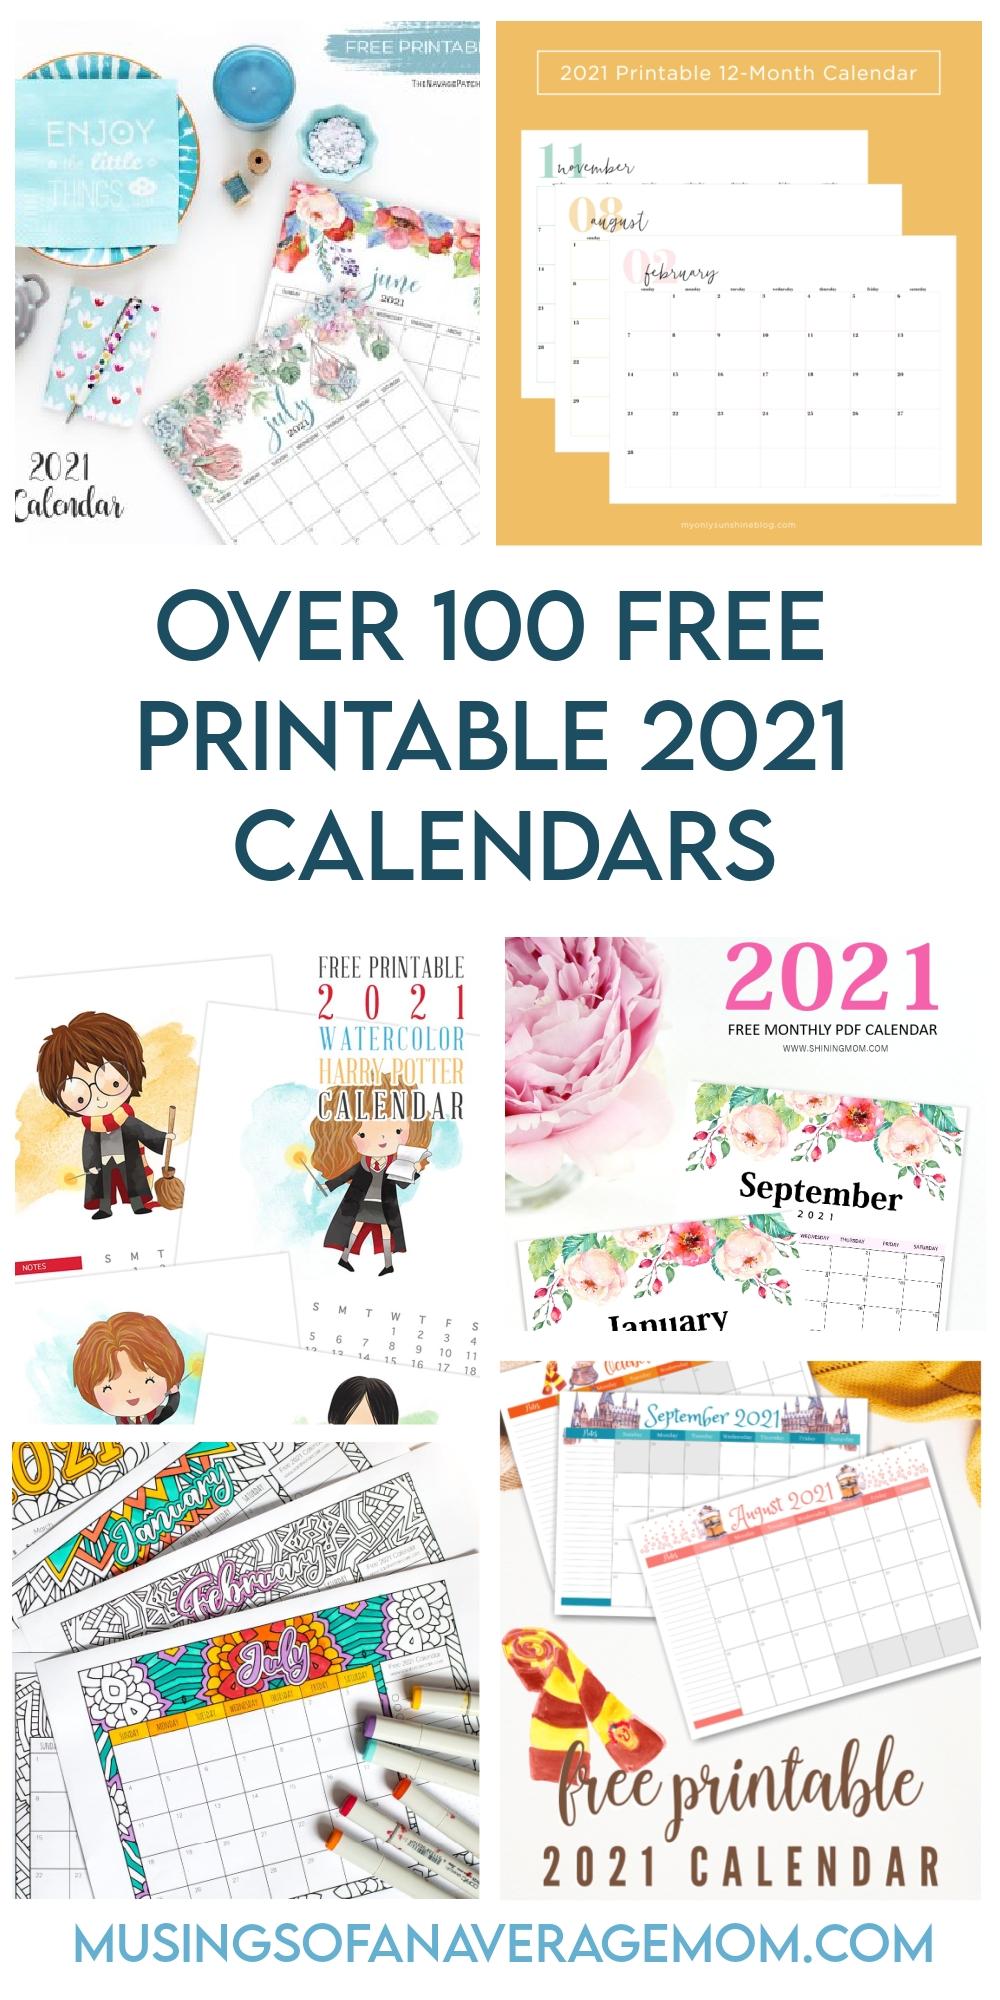 Take Imom 2021 Gingerbread Calendar